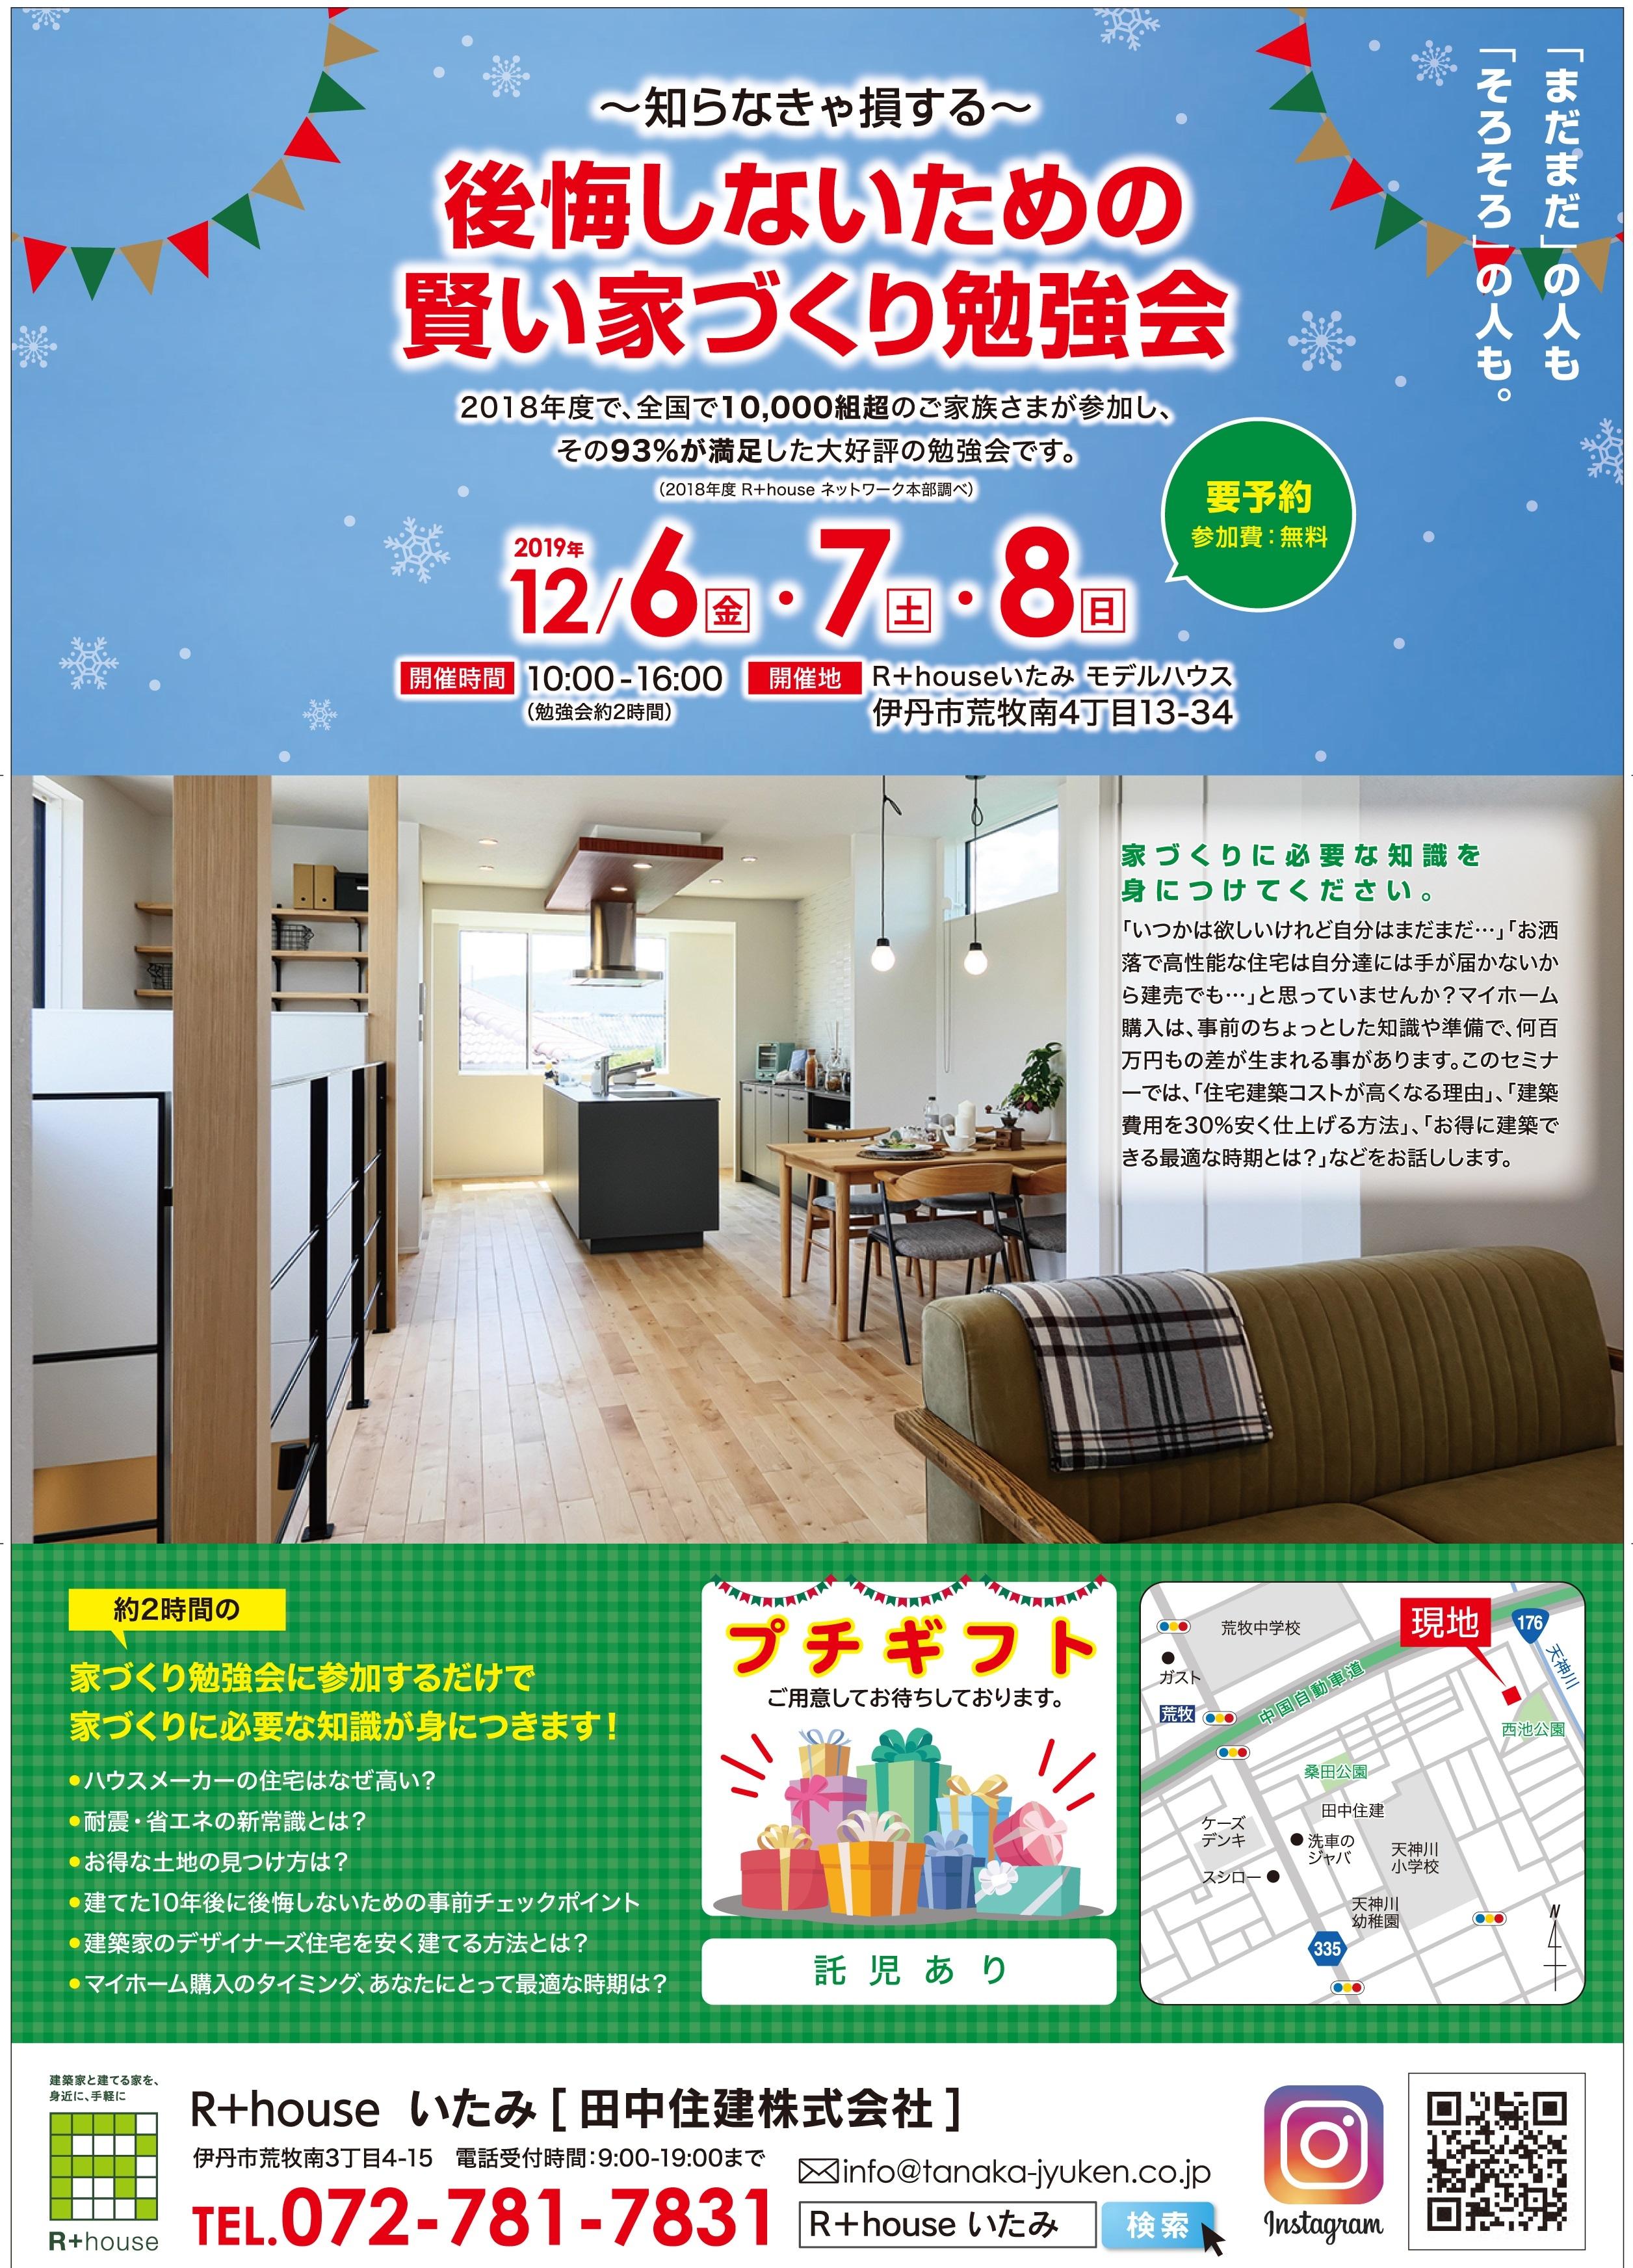 kobetsu_model.jpg